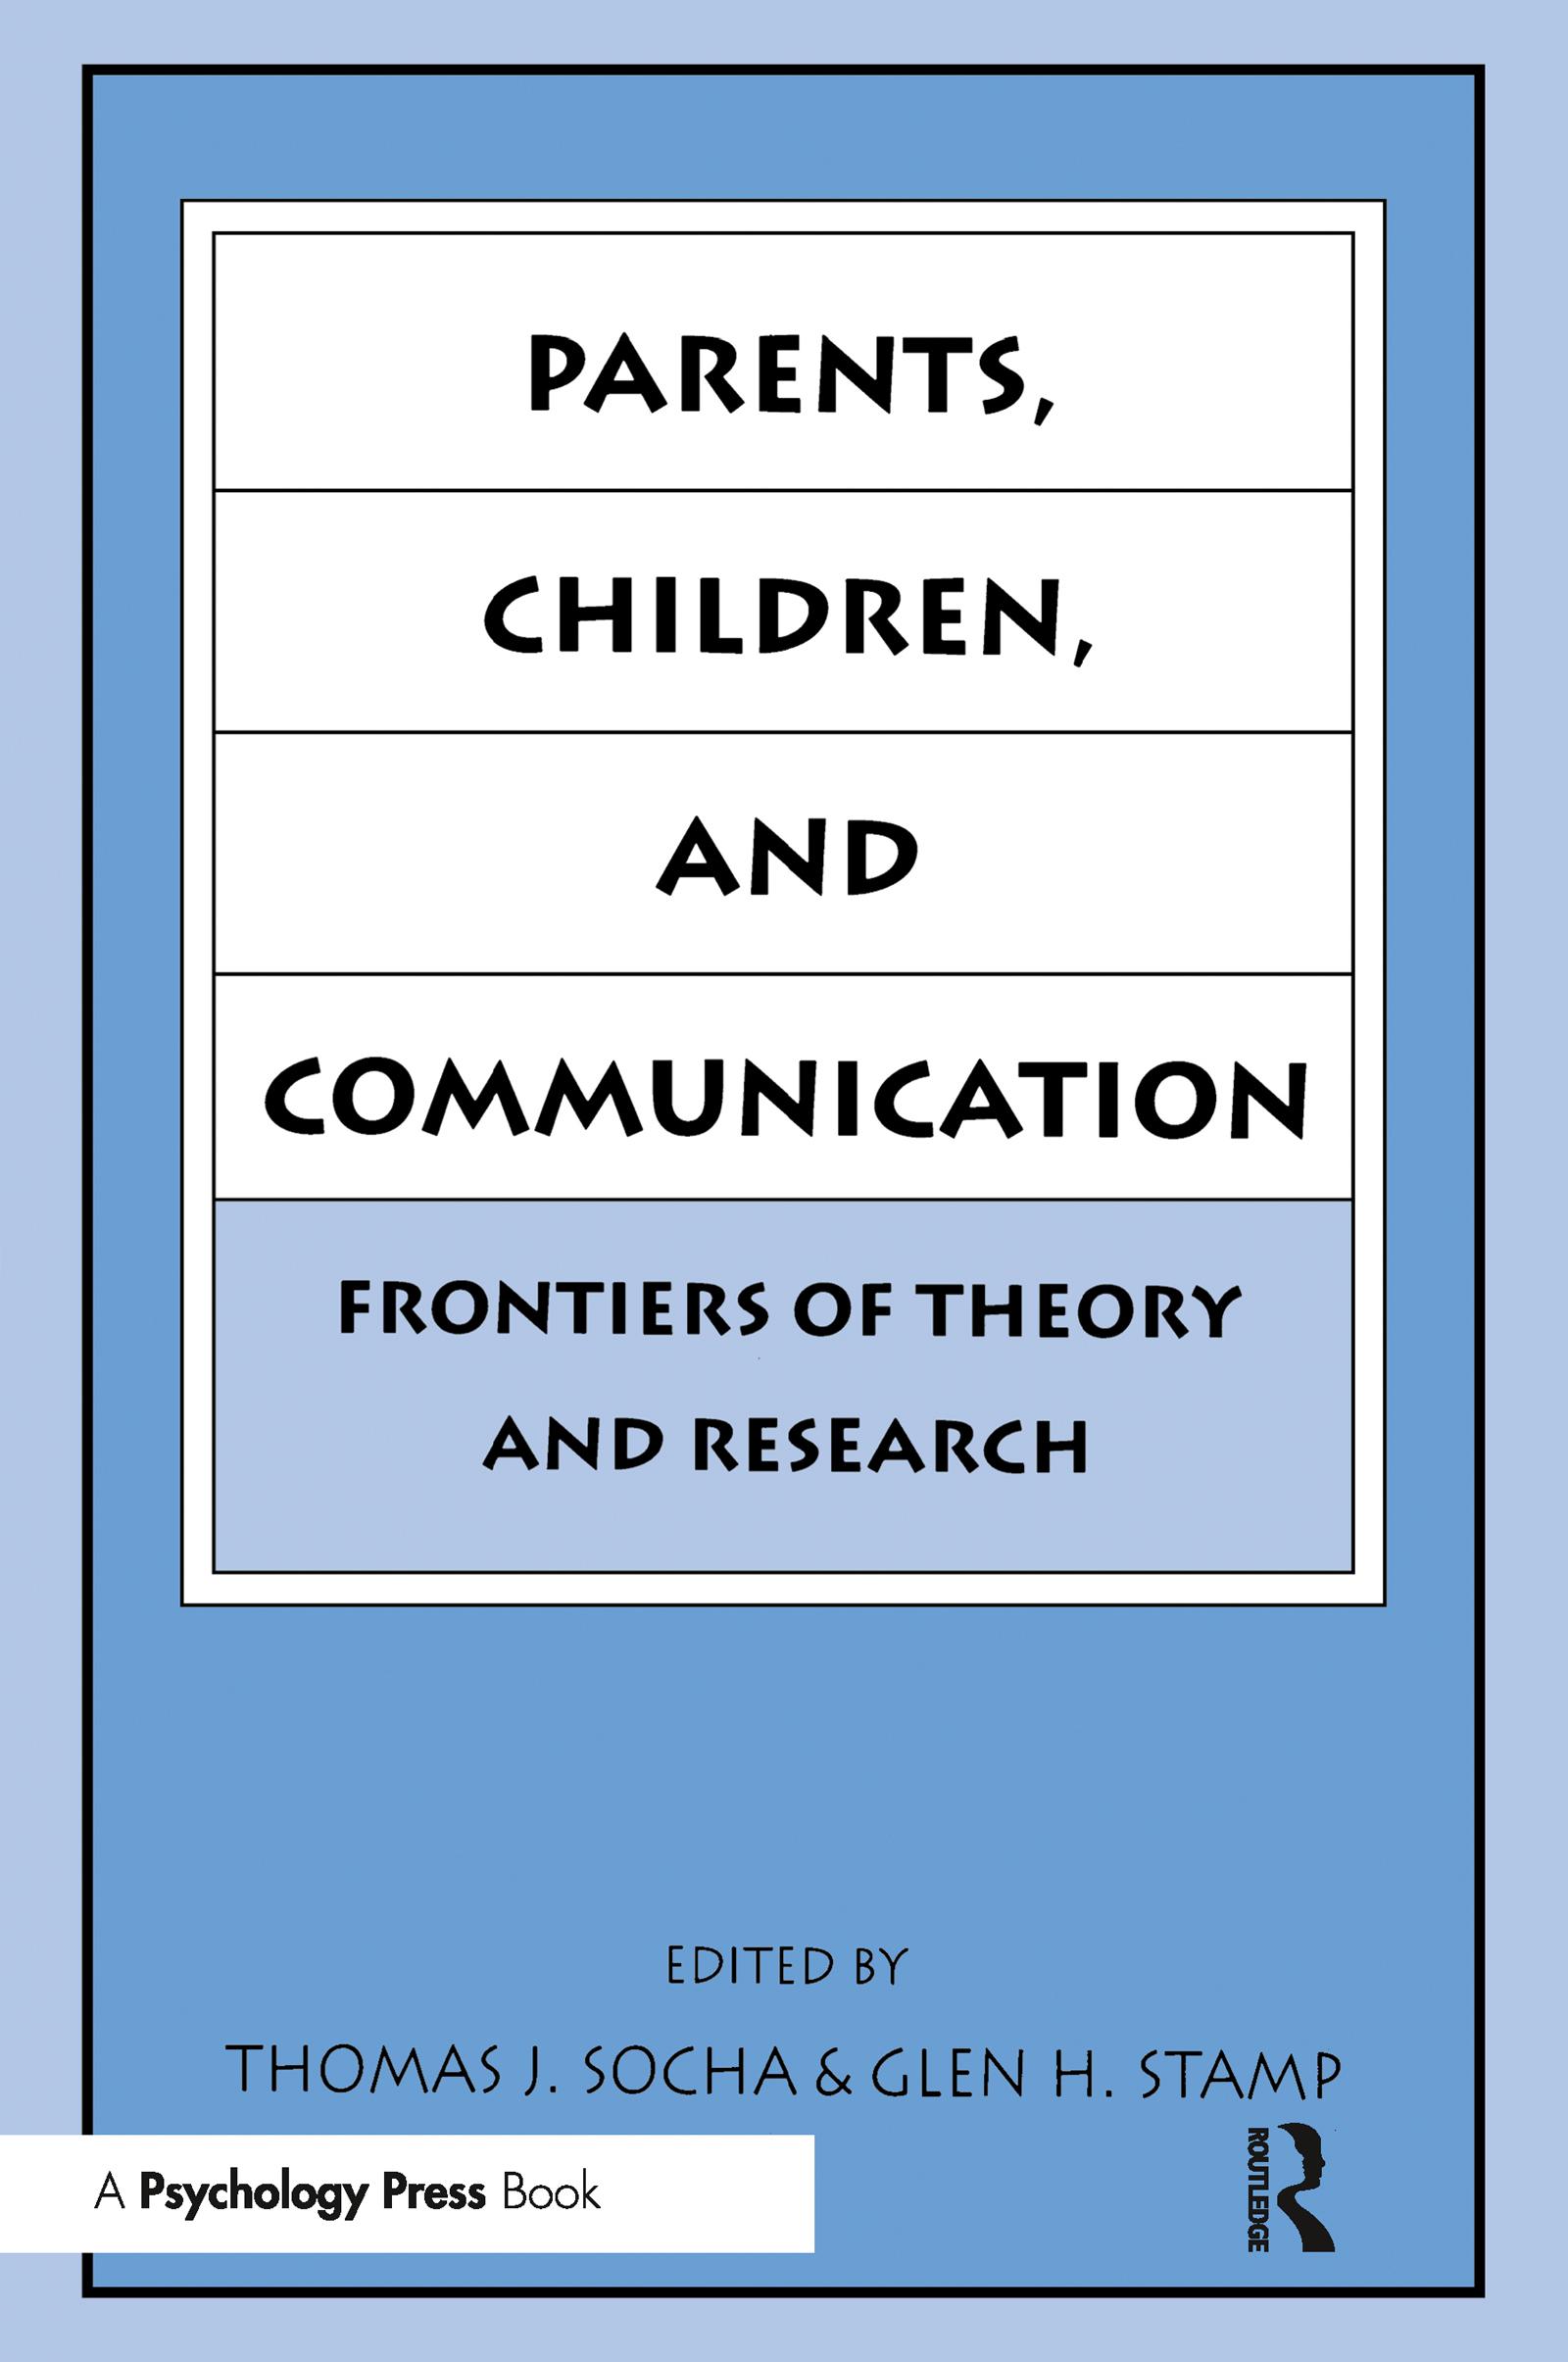 Parents, Children, and Communication